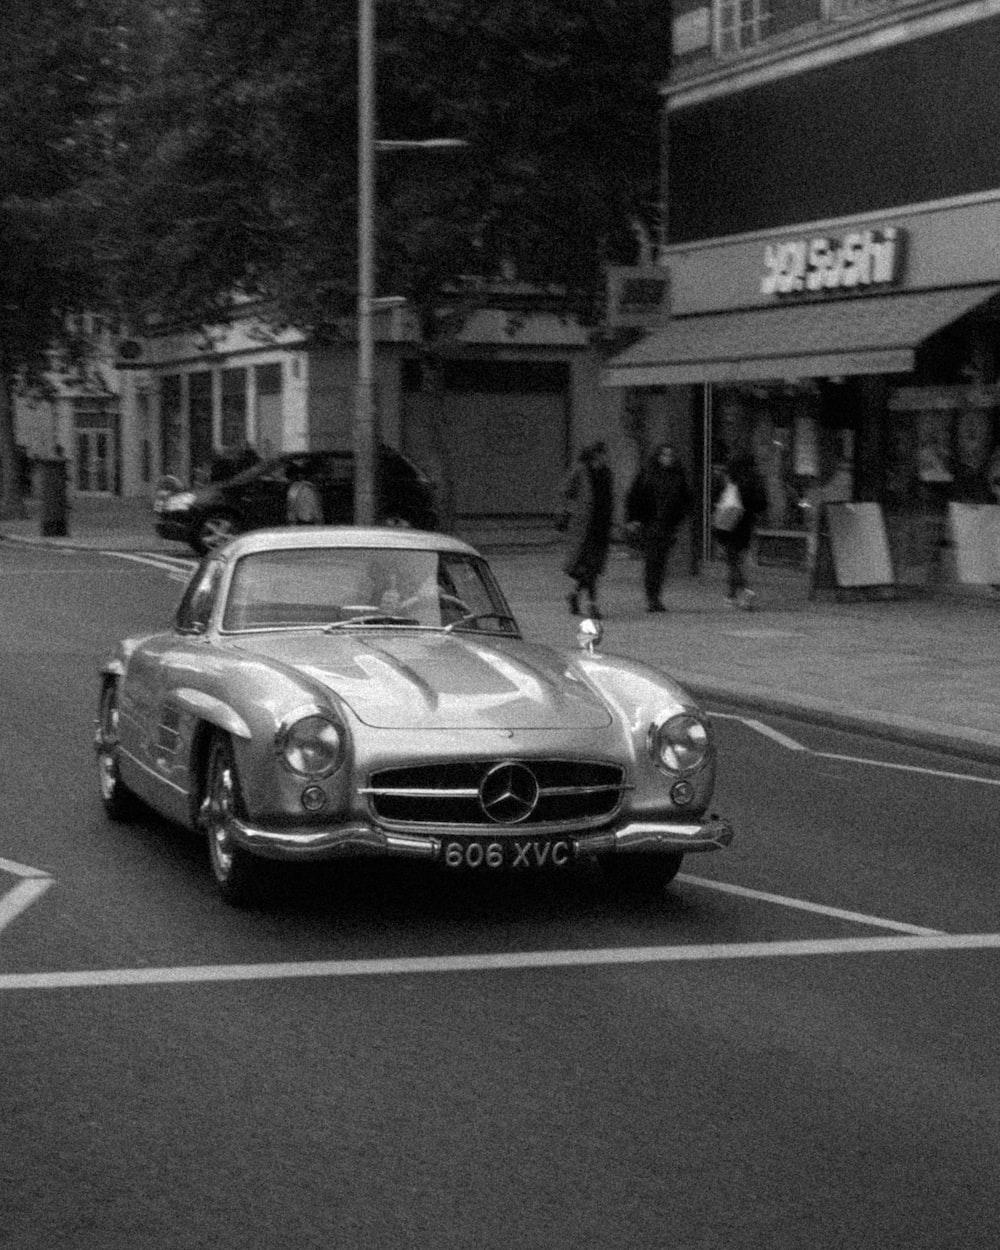 silver Mercedes-Benz car on road